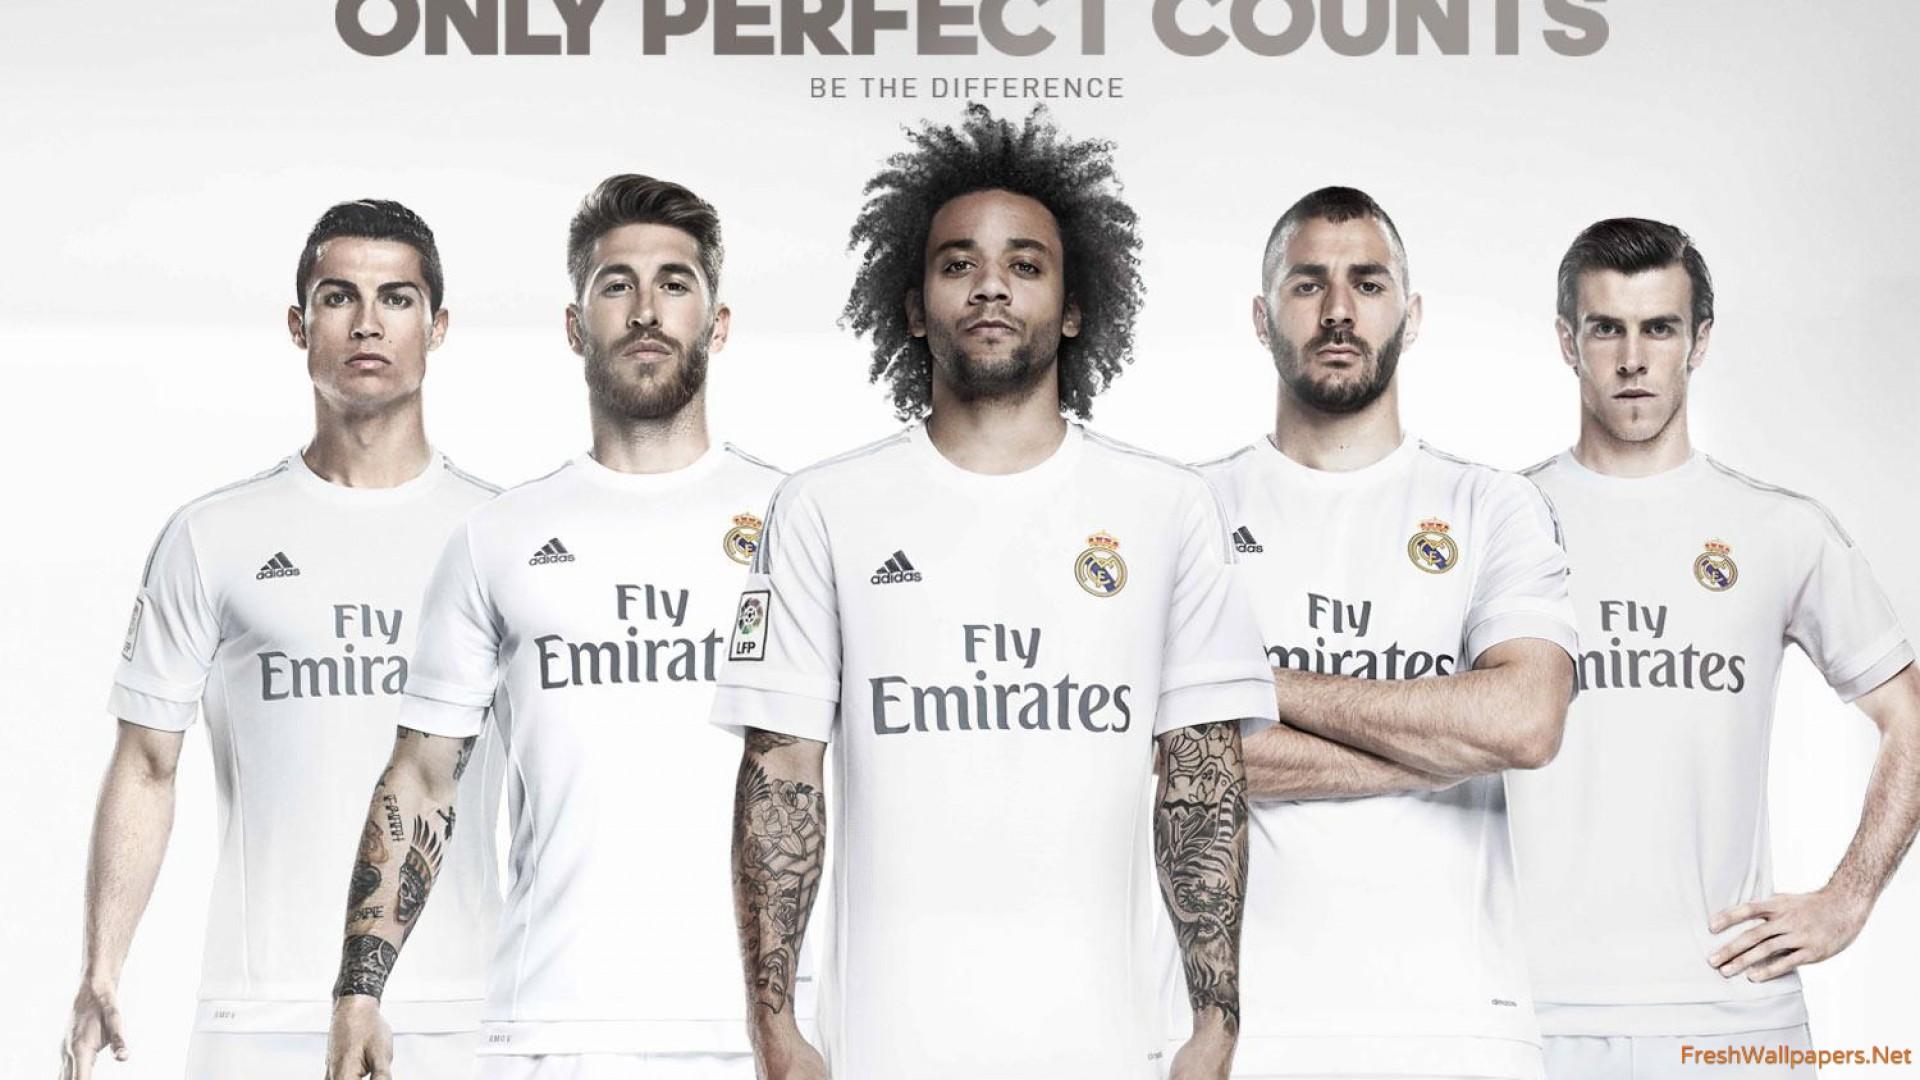 Real Madrid CF 2015 2016 Kit wallpapers Freshwallpapers 1920x1080